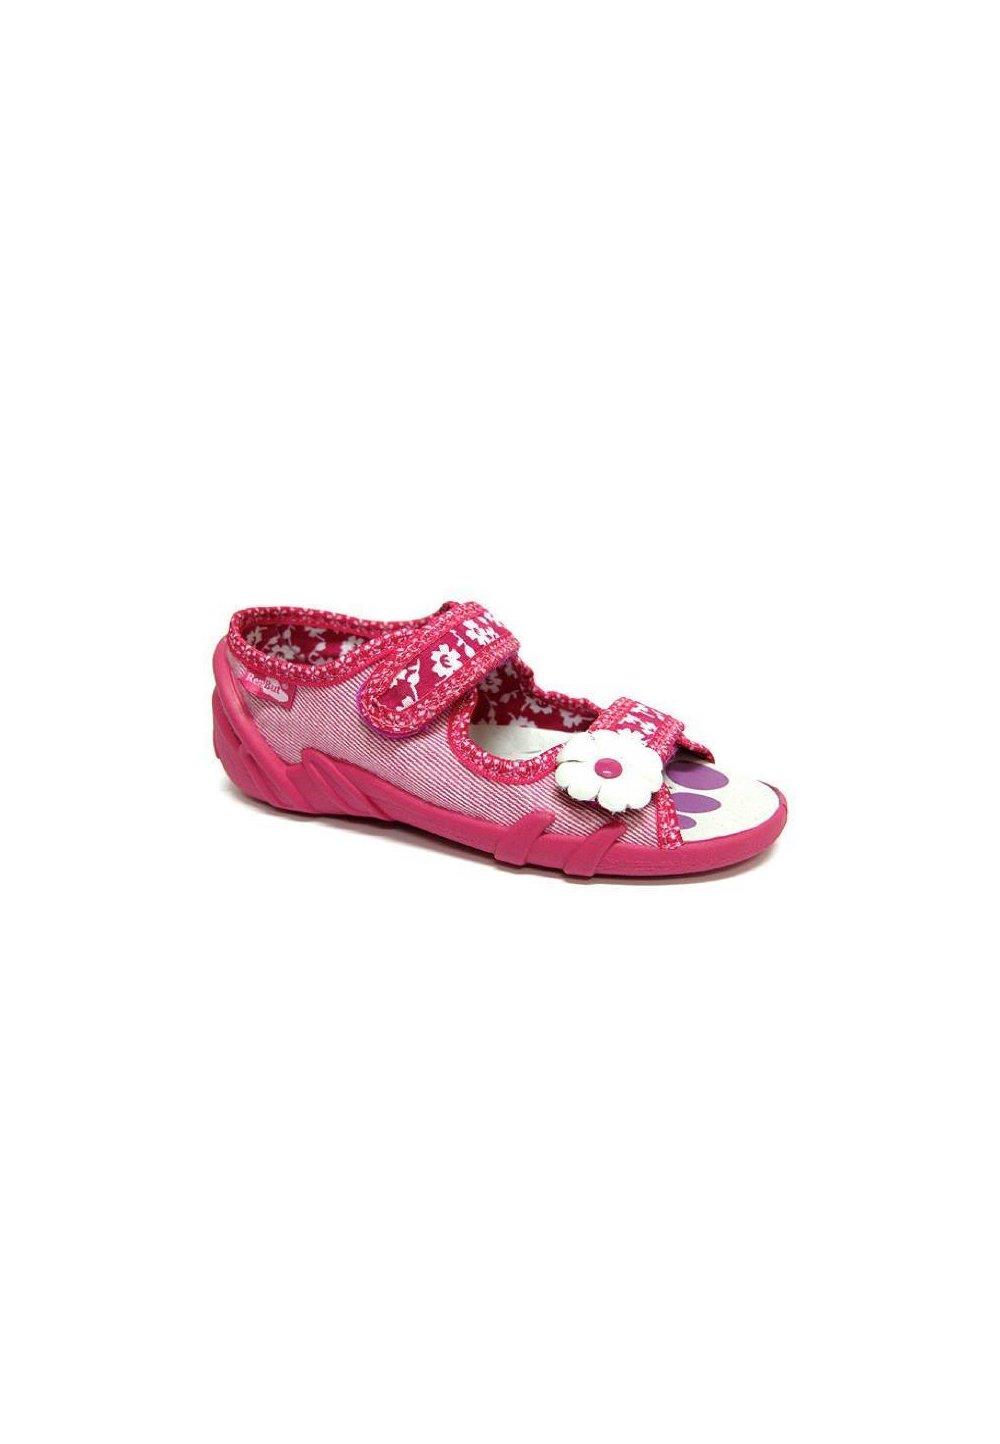 Sandale 33-378-0164 imagine